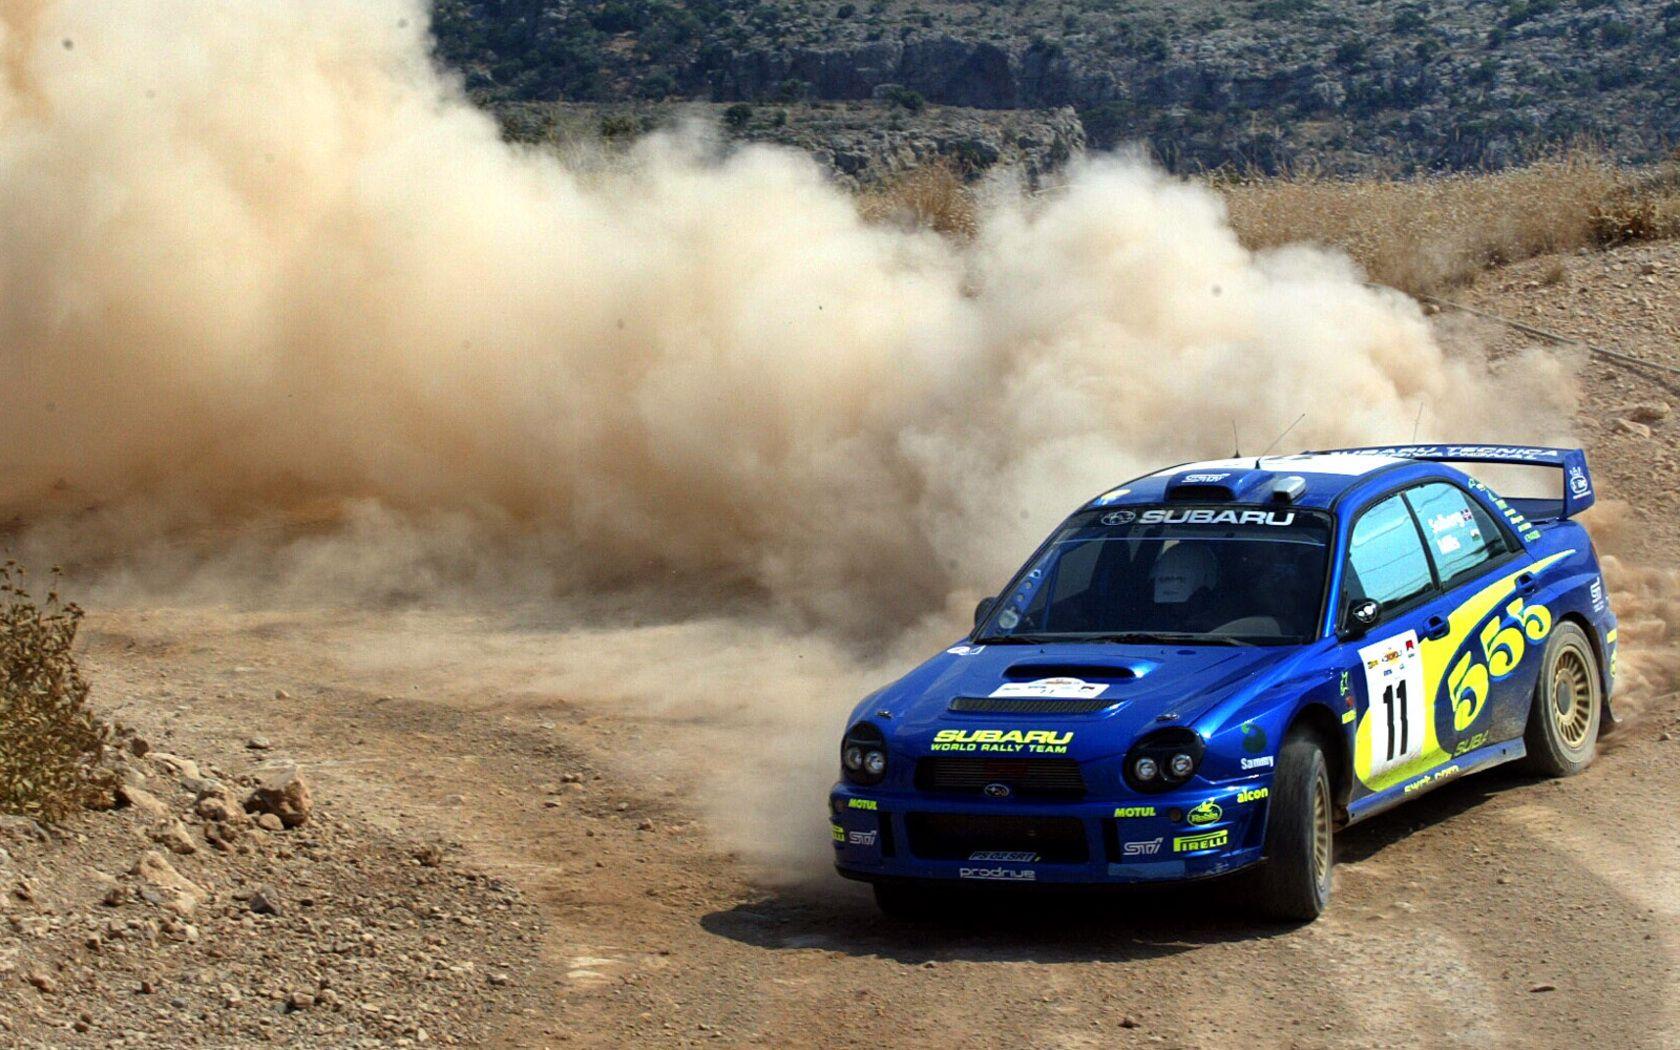 Rally car blue subaru drifting leaving a massive dust cloud in its wake